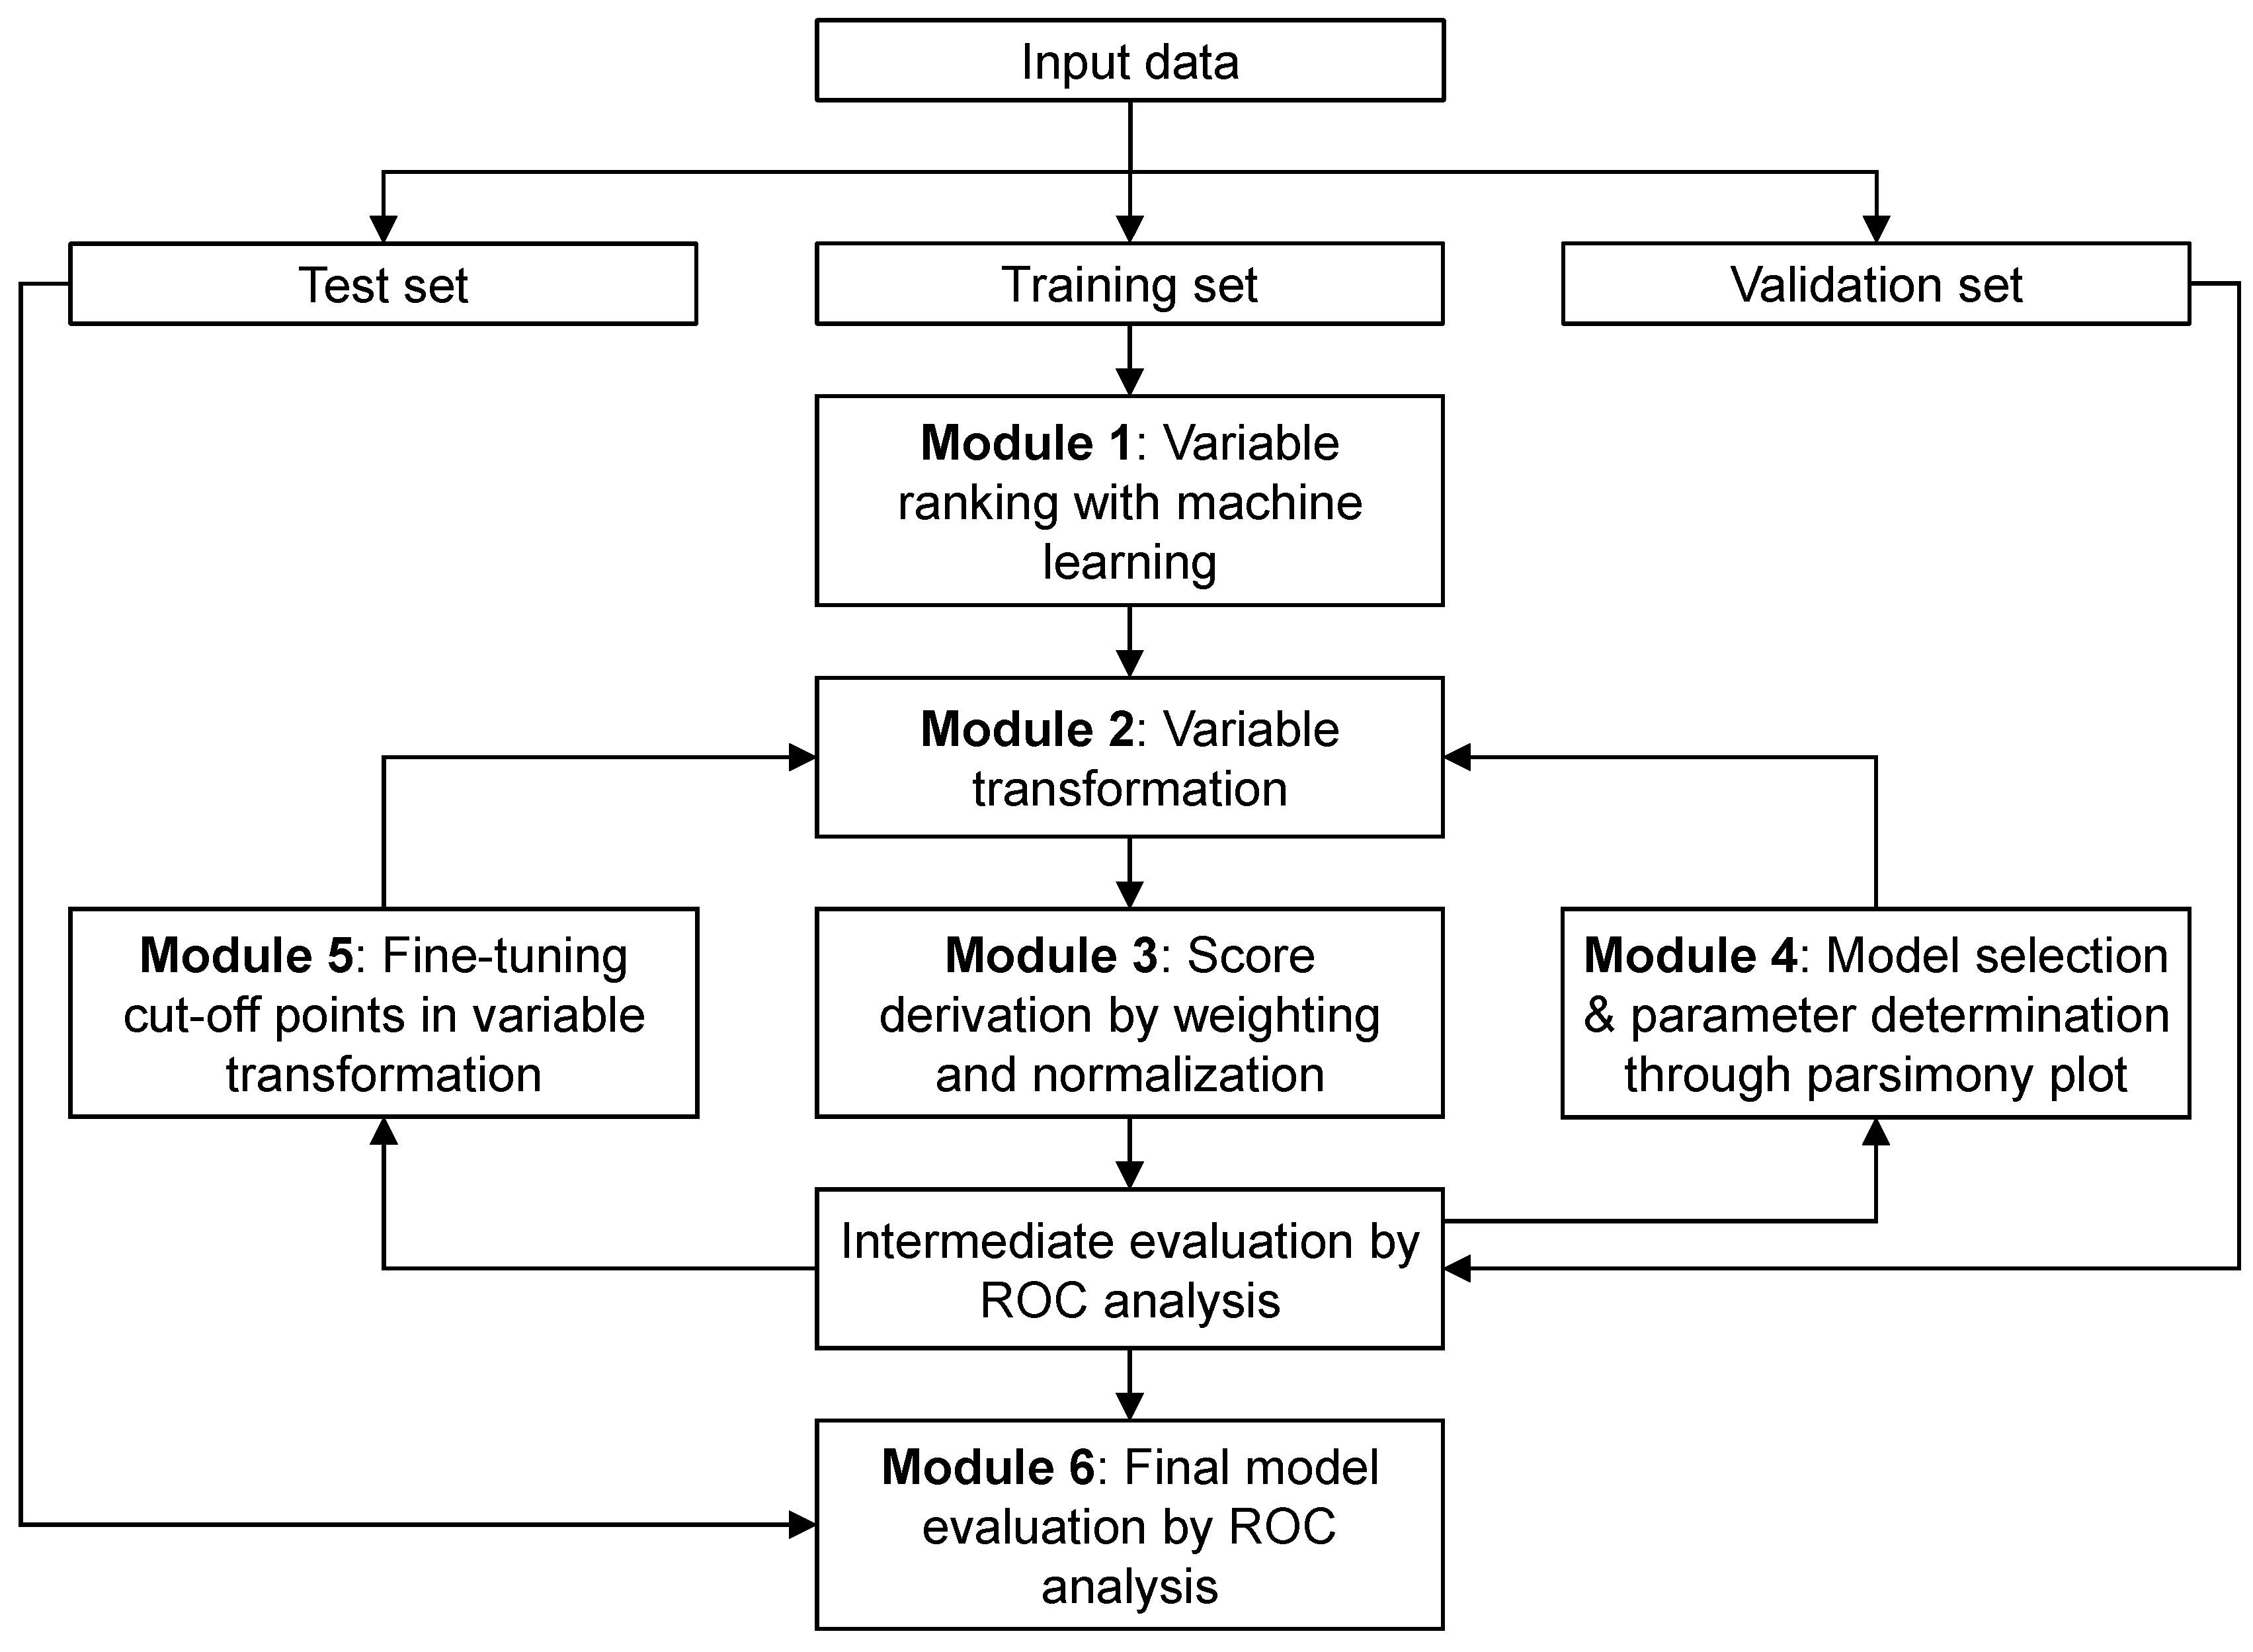 The flowchart of AutoScore